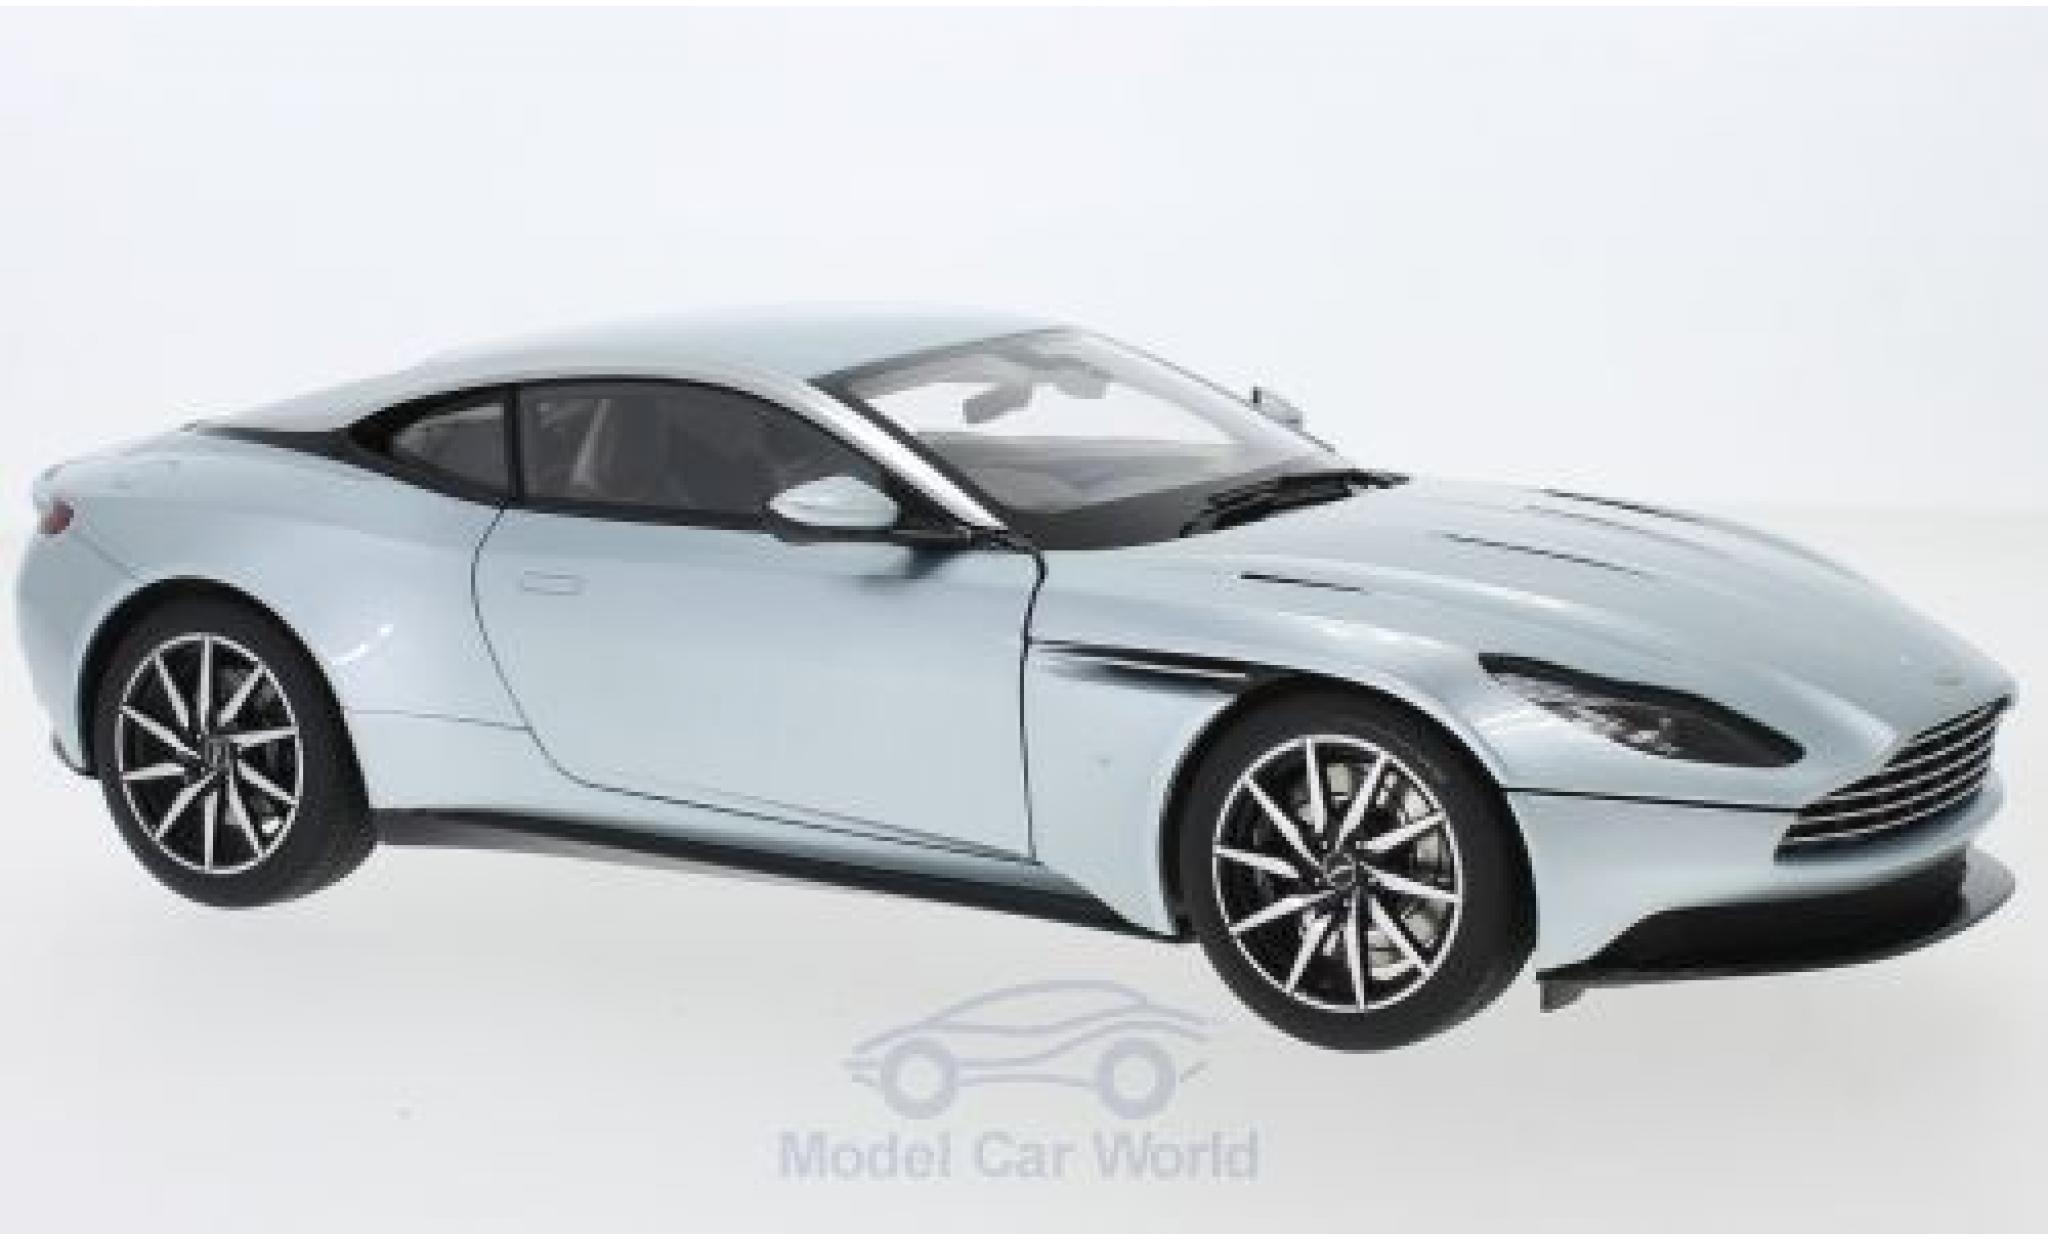 Aston Martin DB1 1/18 AUTOart 1 grey RHD 2017